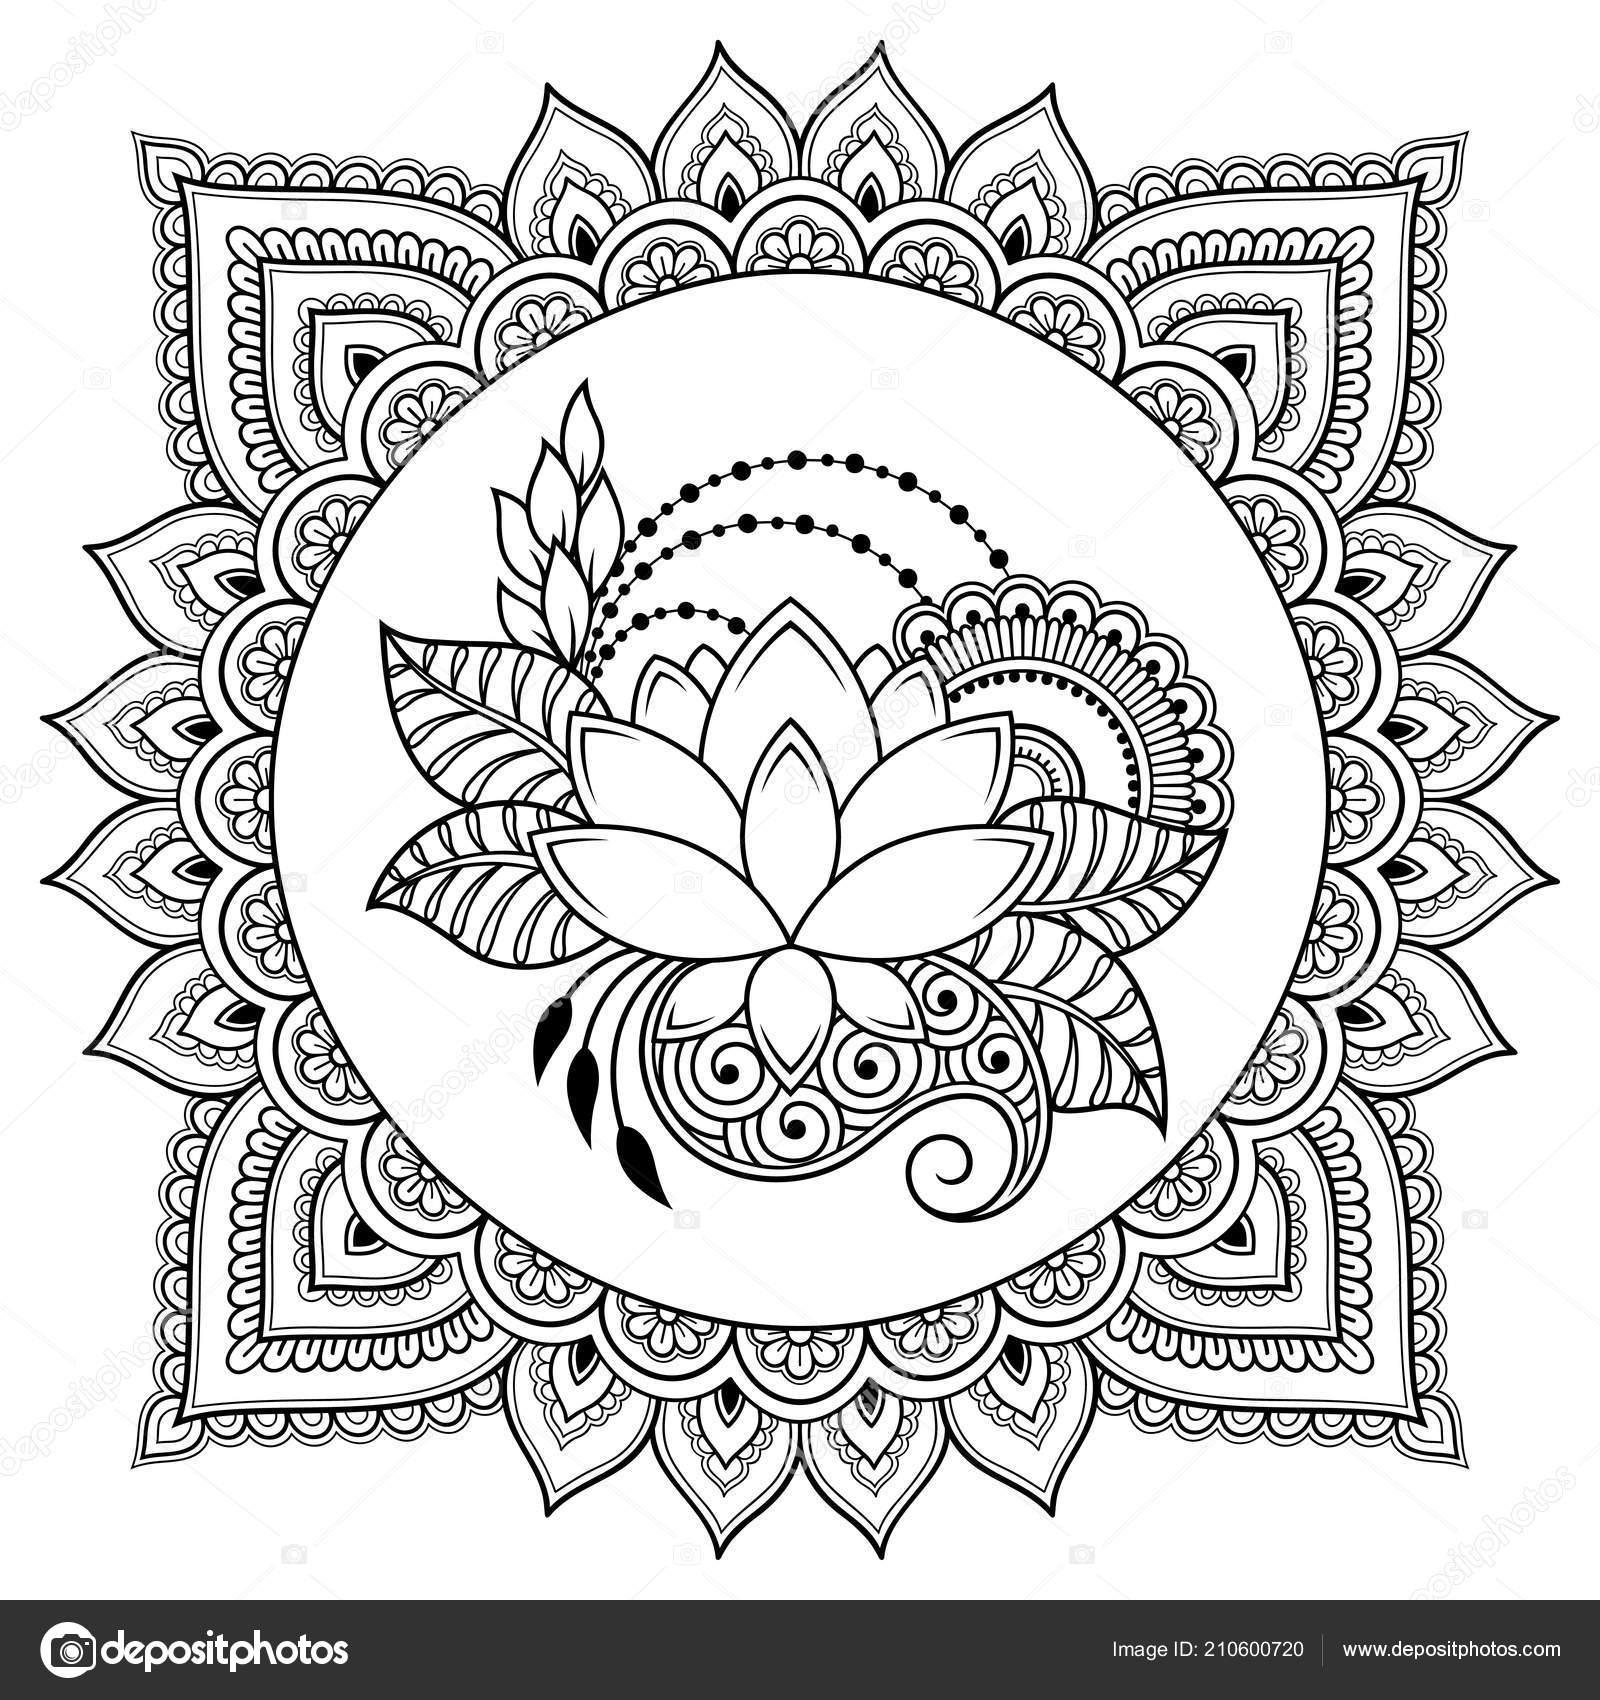 Circular pattern form mandala lotus flower henna mehndi tattoo circular pattern form mandala lotus flower henna mehndi tattoo decoration stock vector mightylinksfo